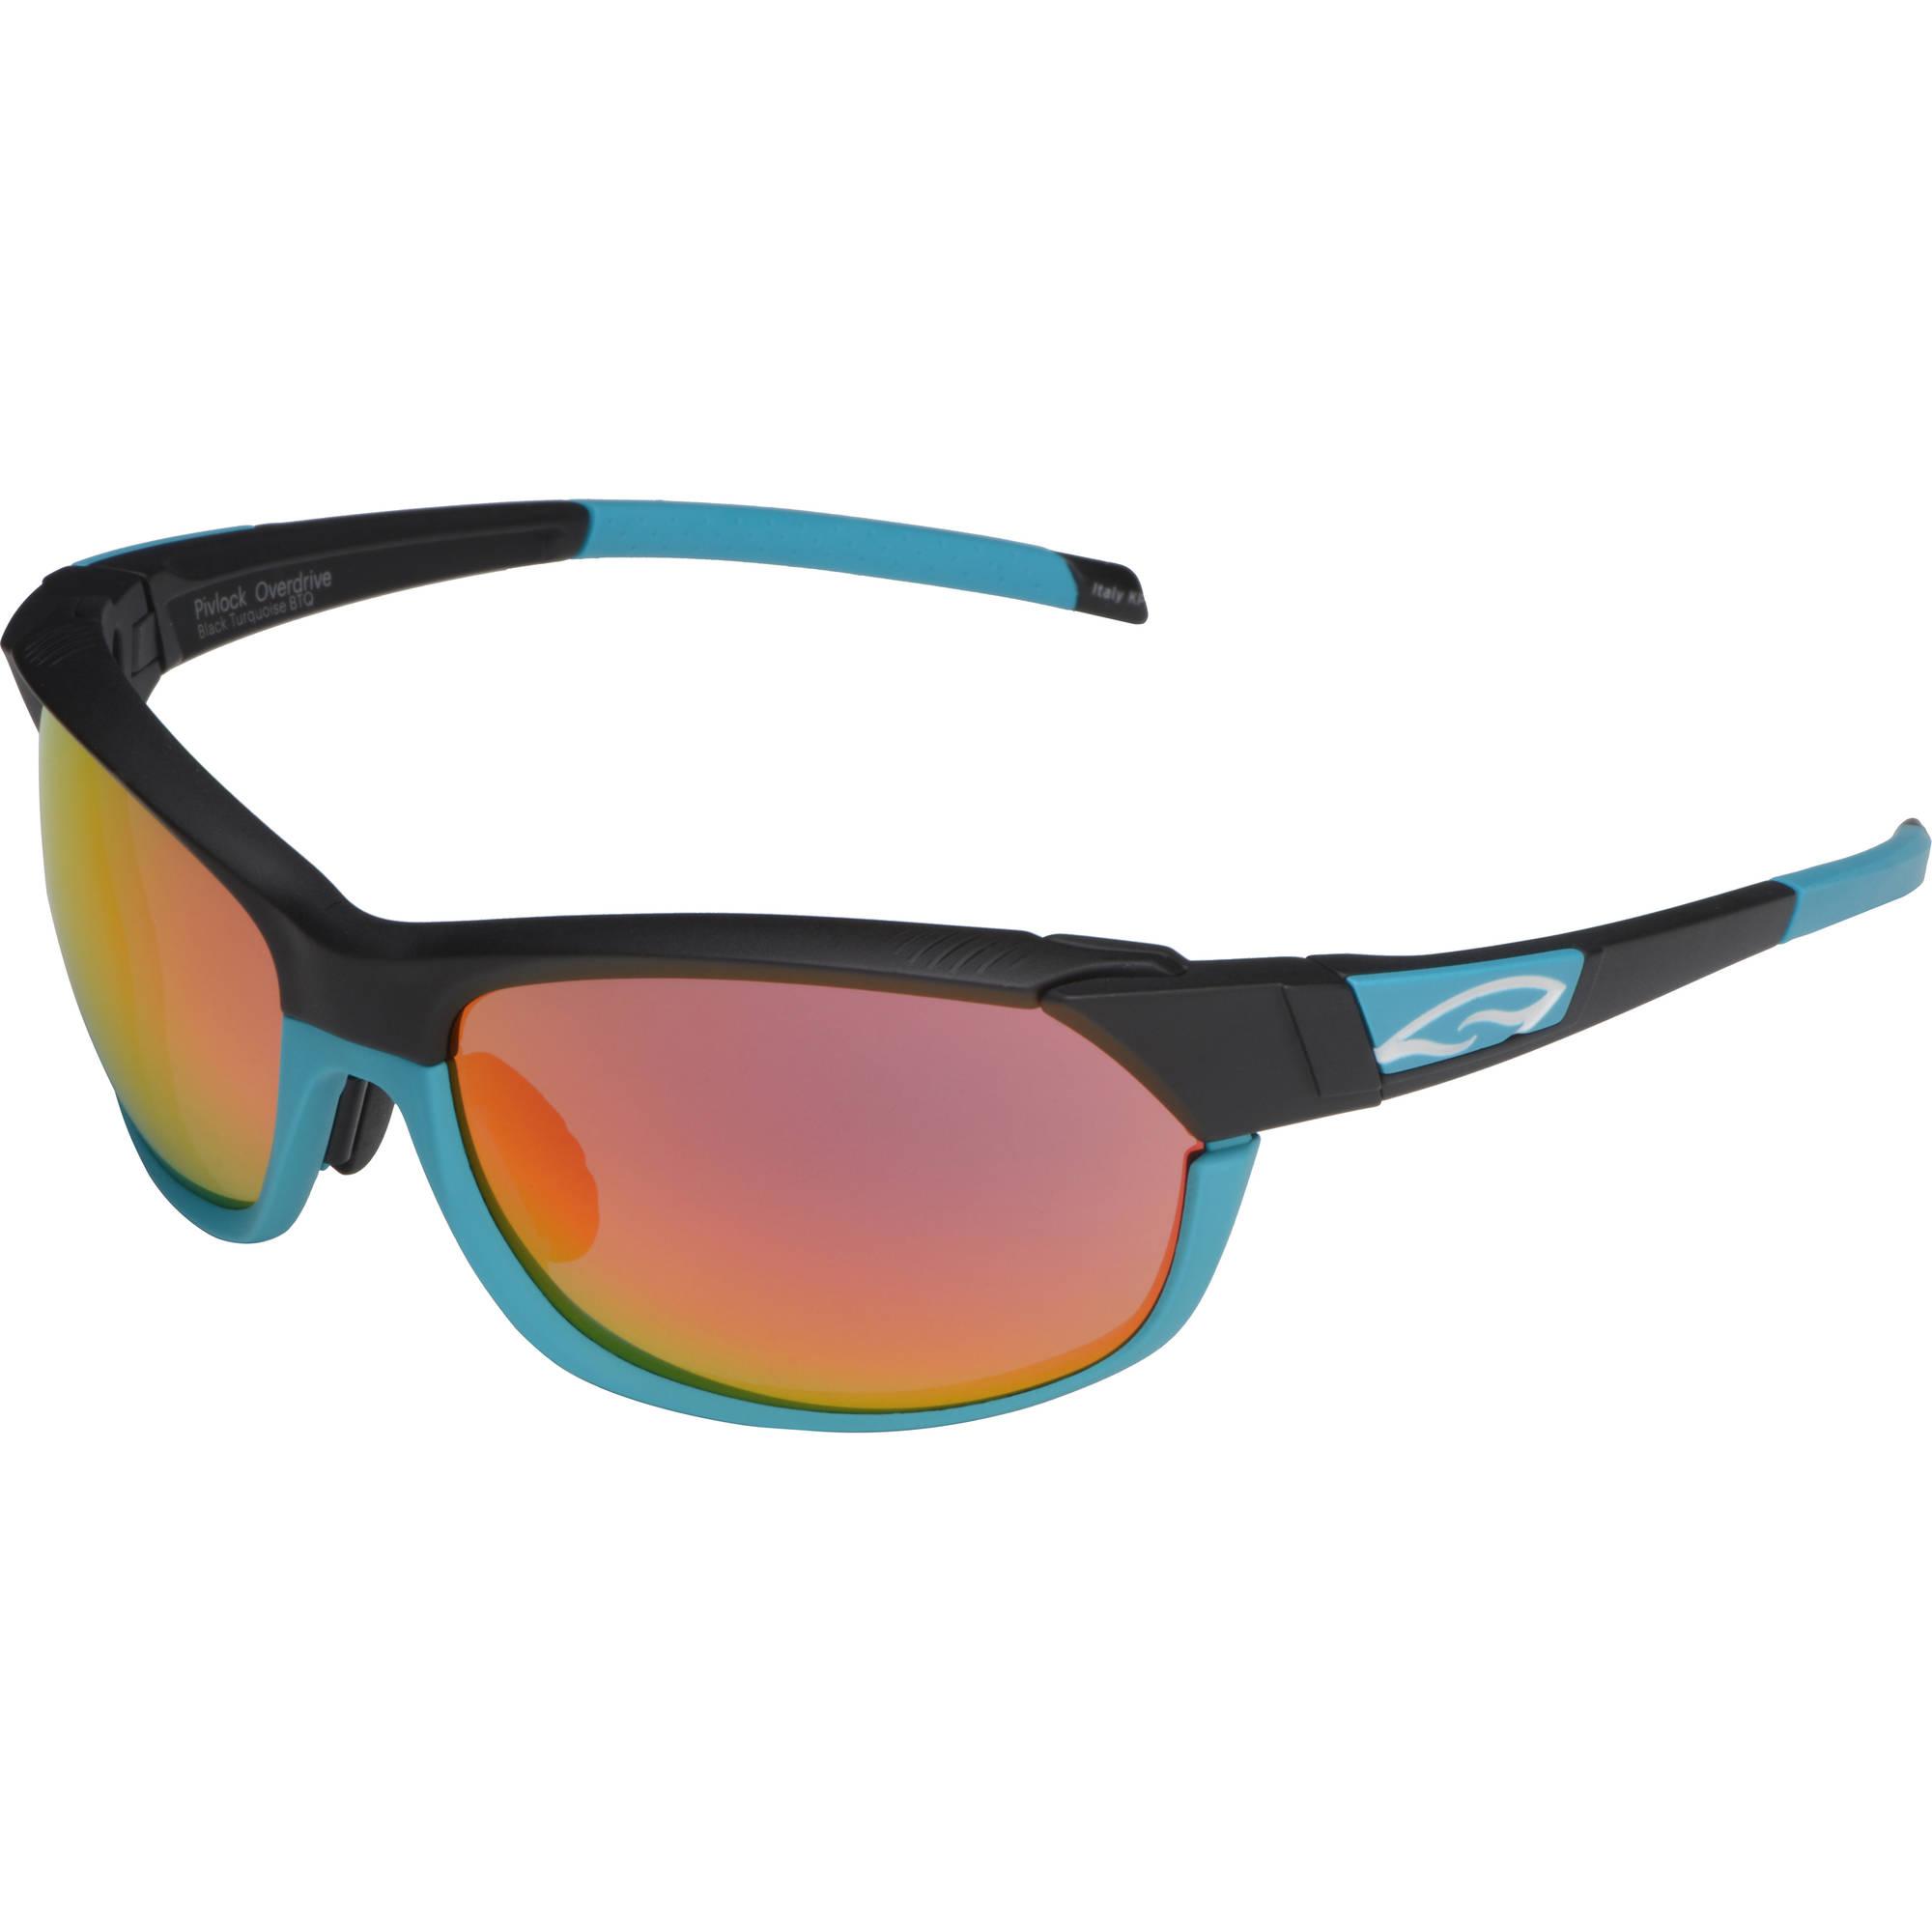 Smith Optics PivLock Overdrive Sunglasses